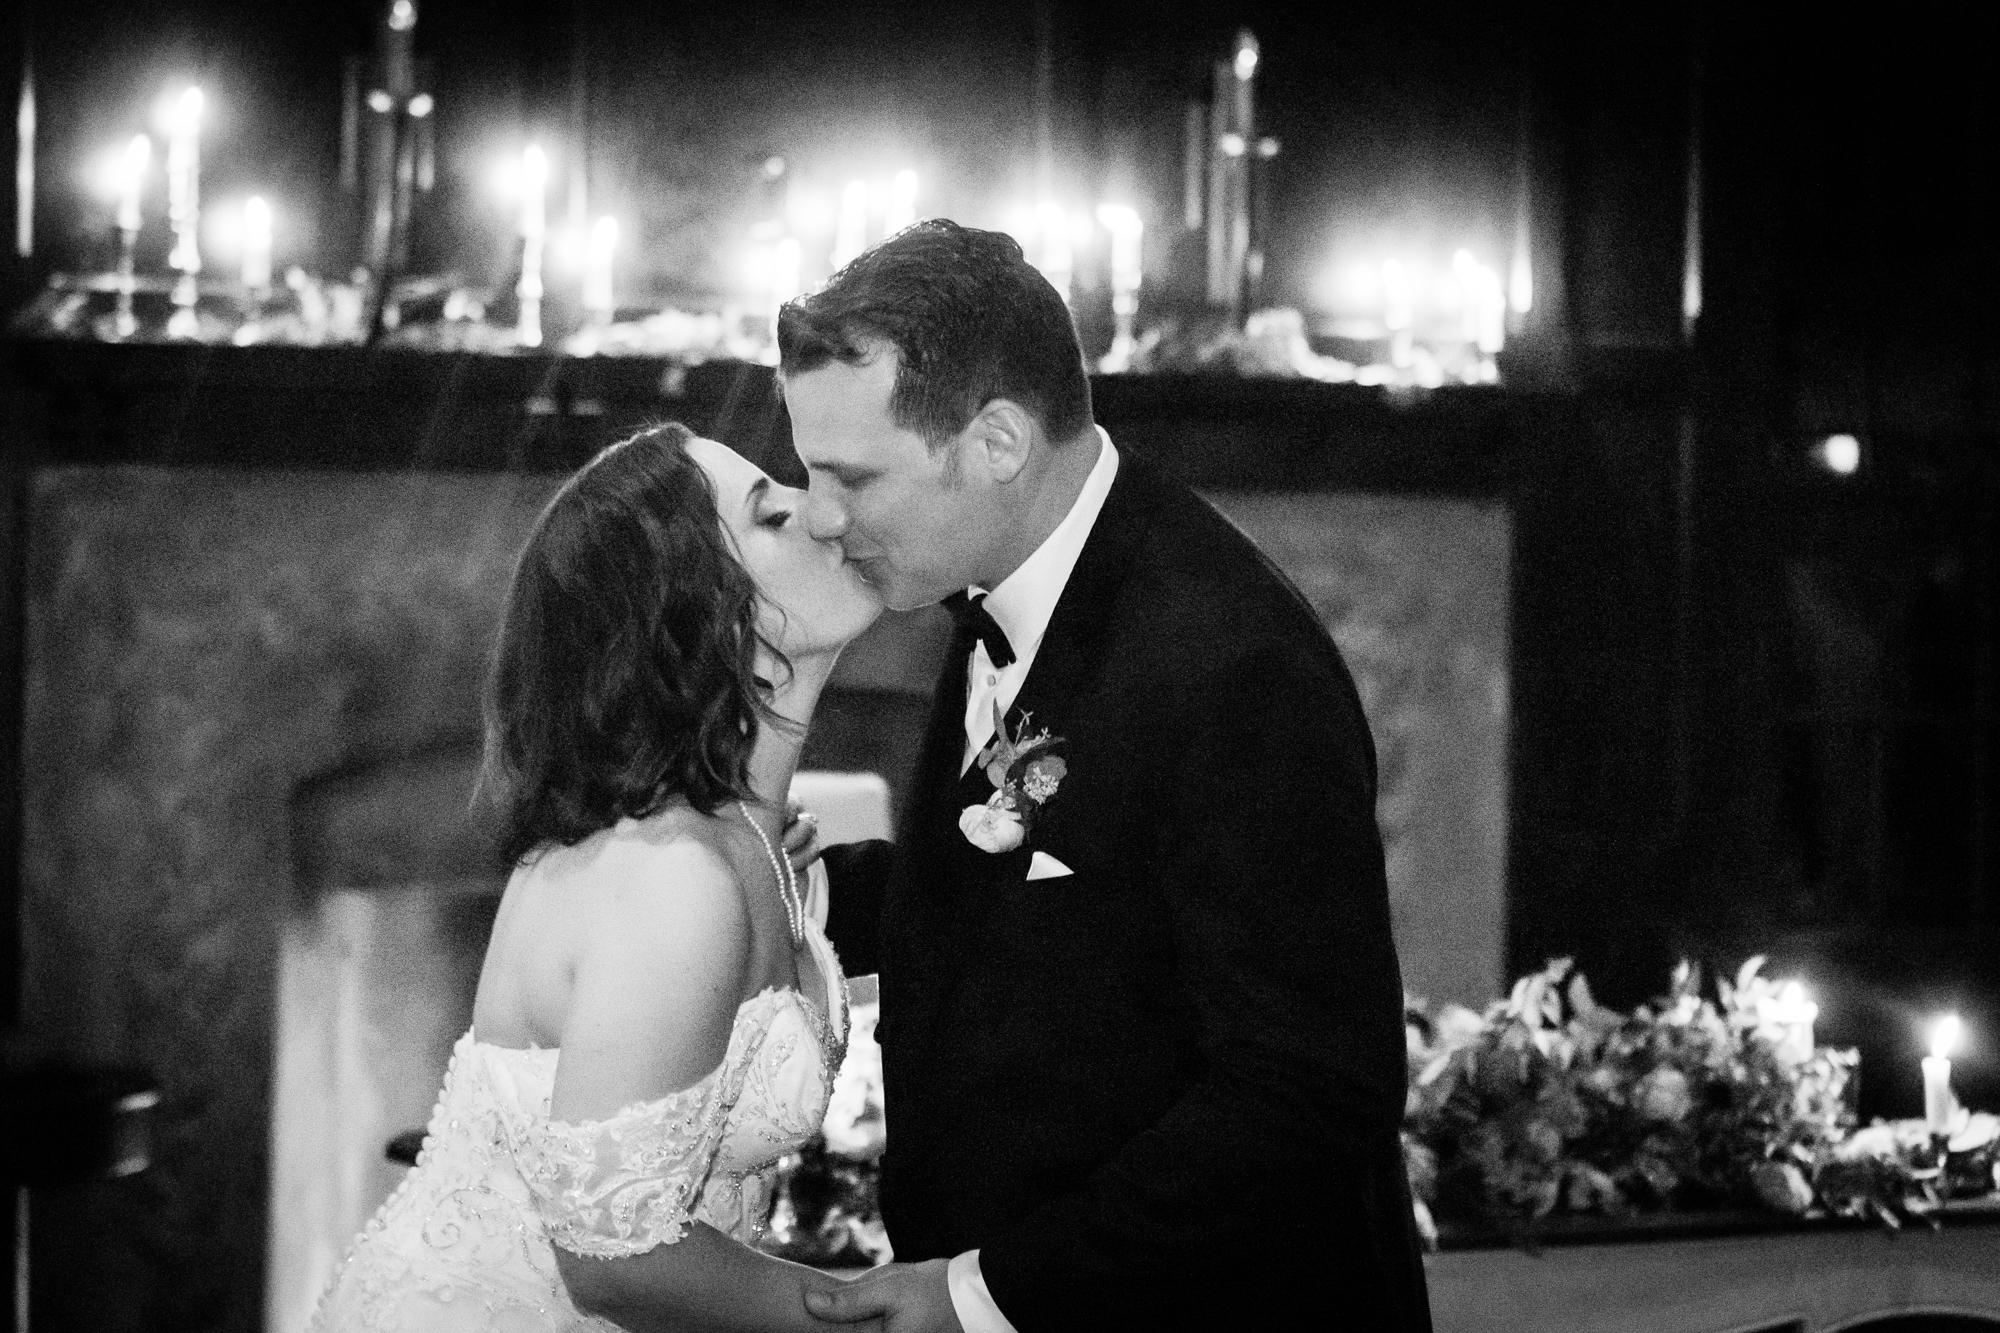 Hotel Du Village - LoveStruck Pictures - Wedding Photography-112.jpg